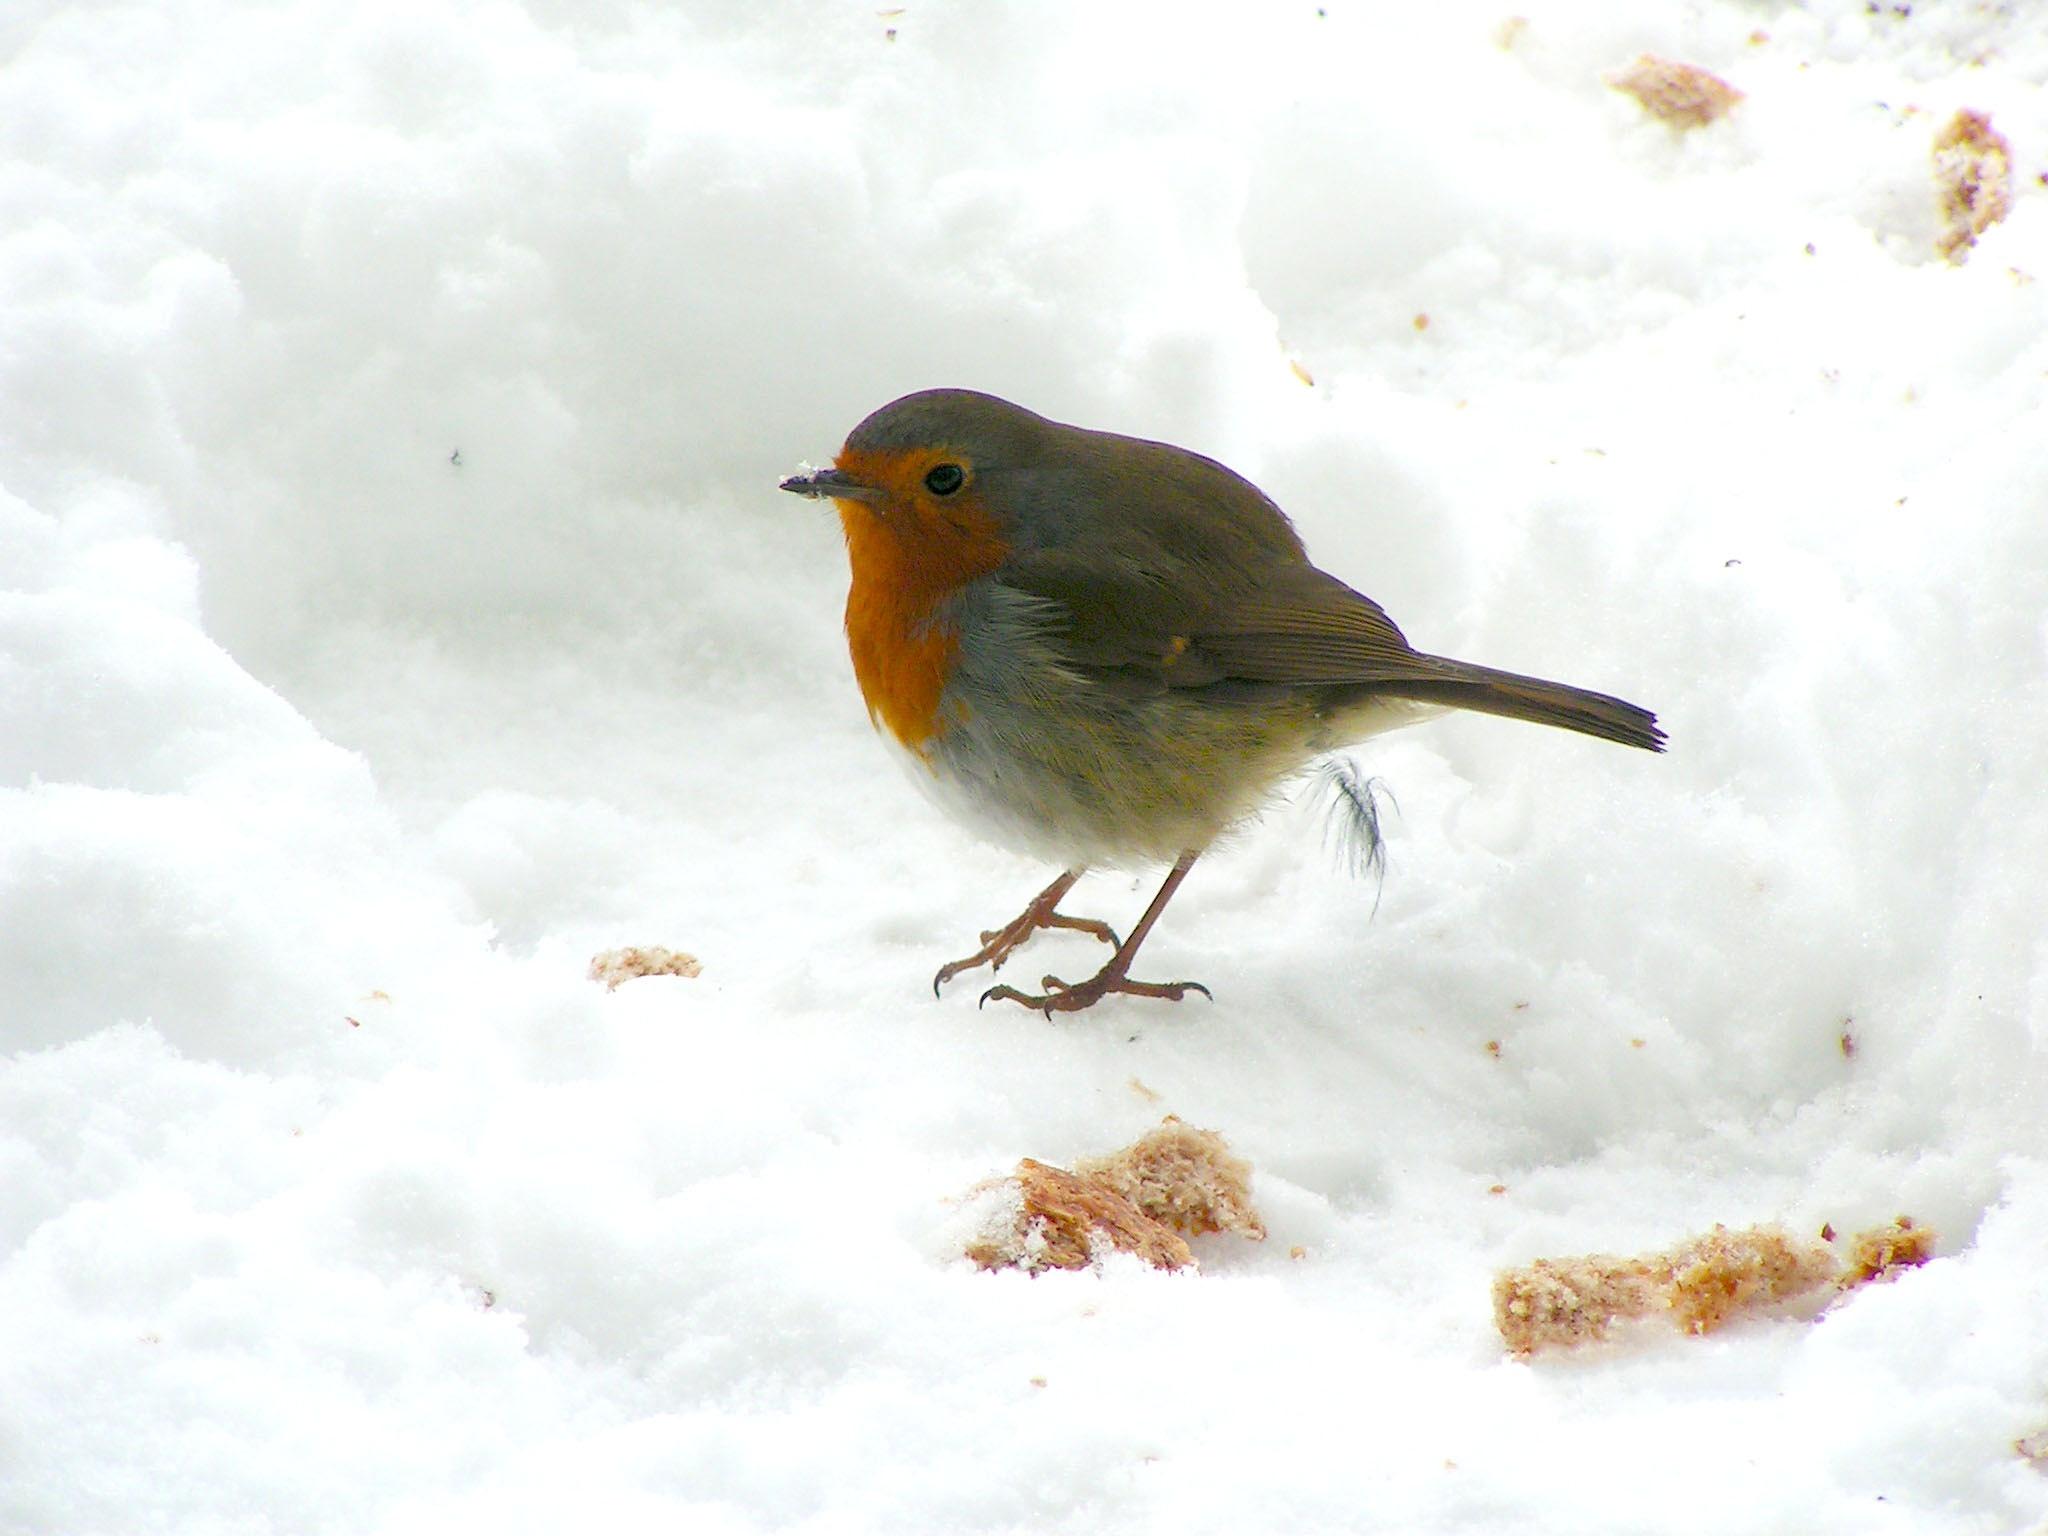 European Robin in the snow by Roelof de Haan